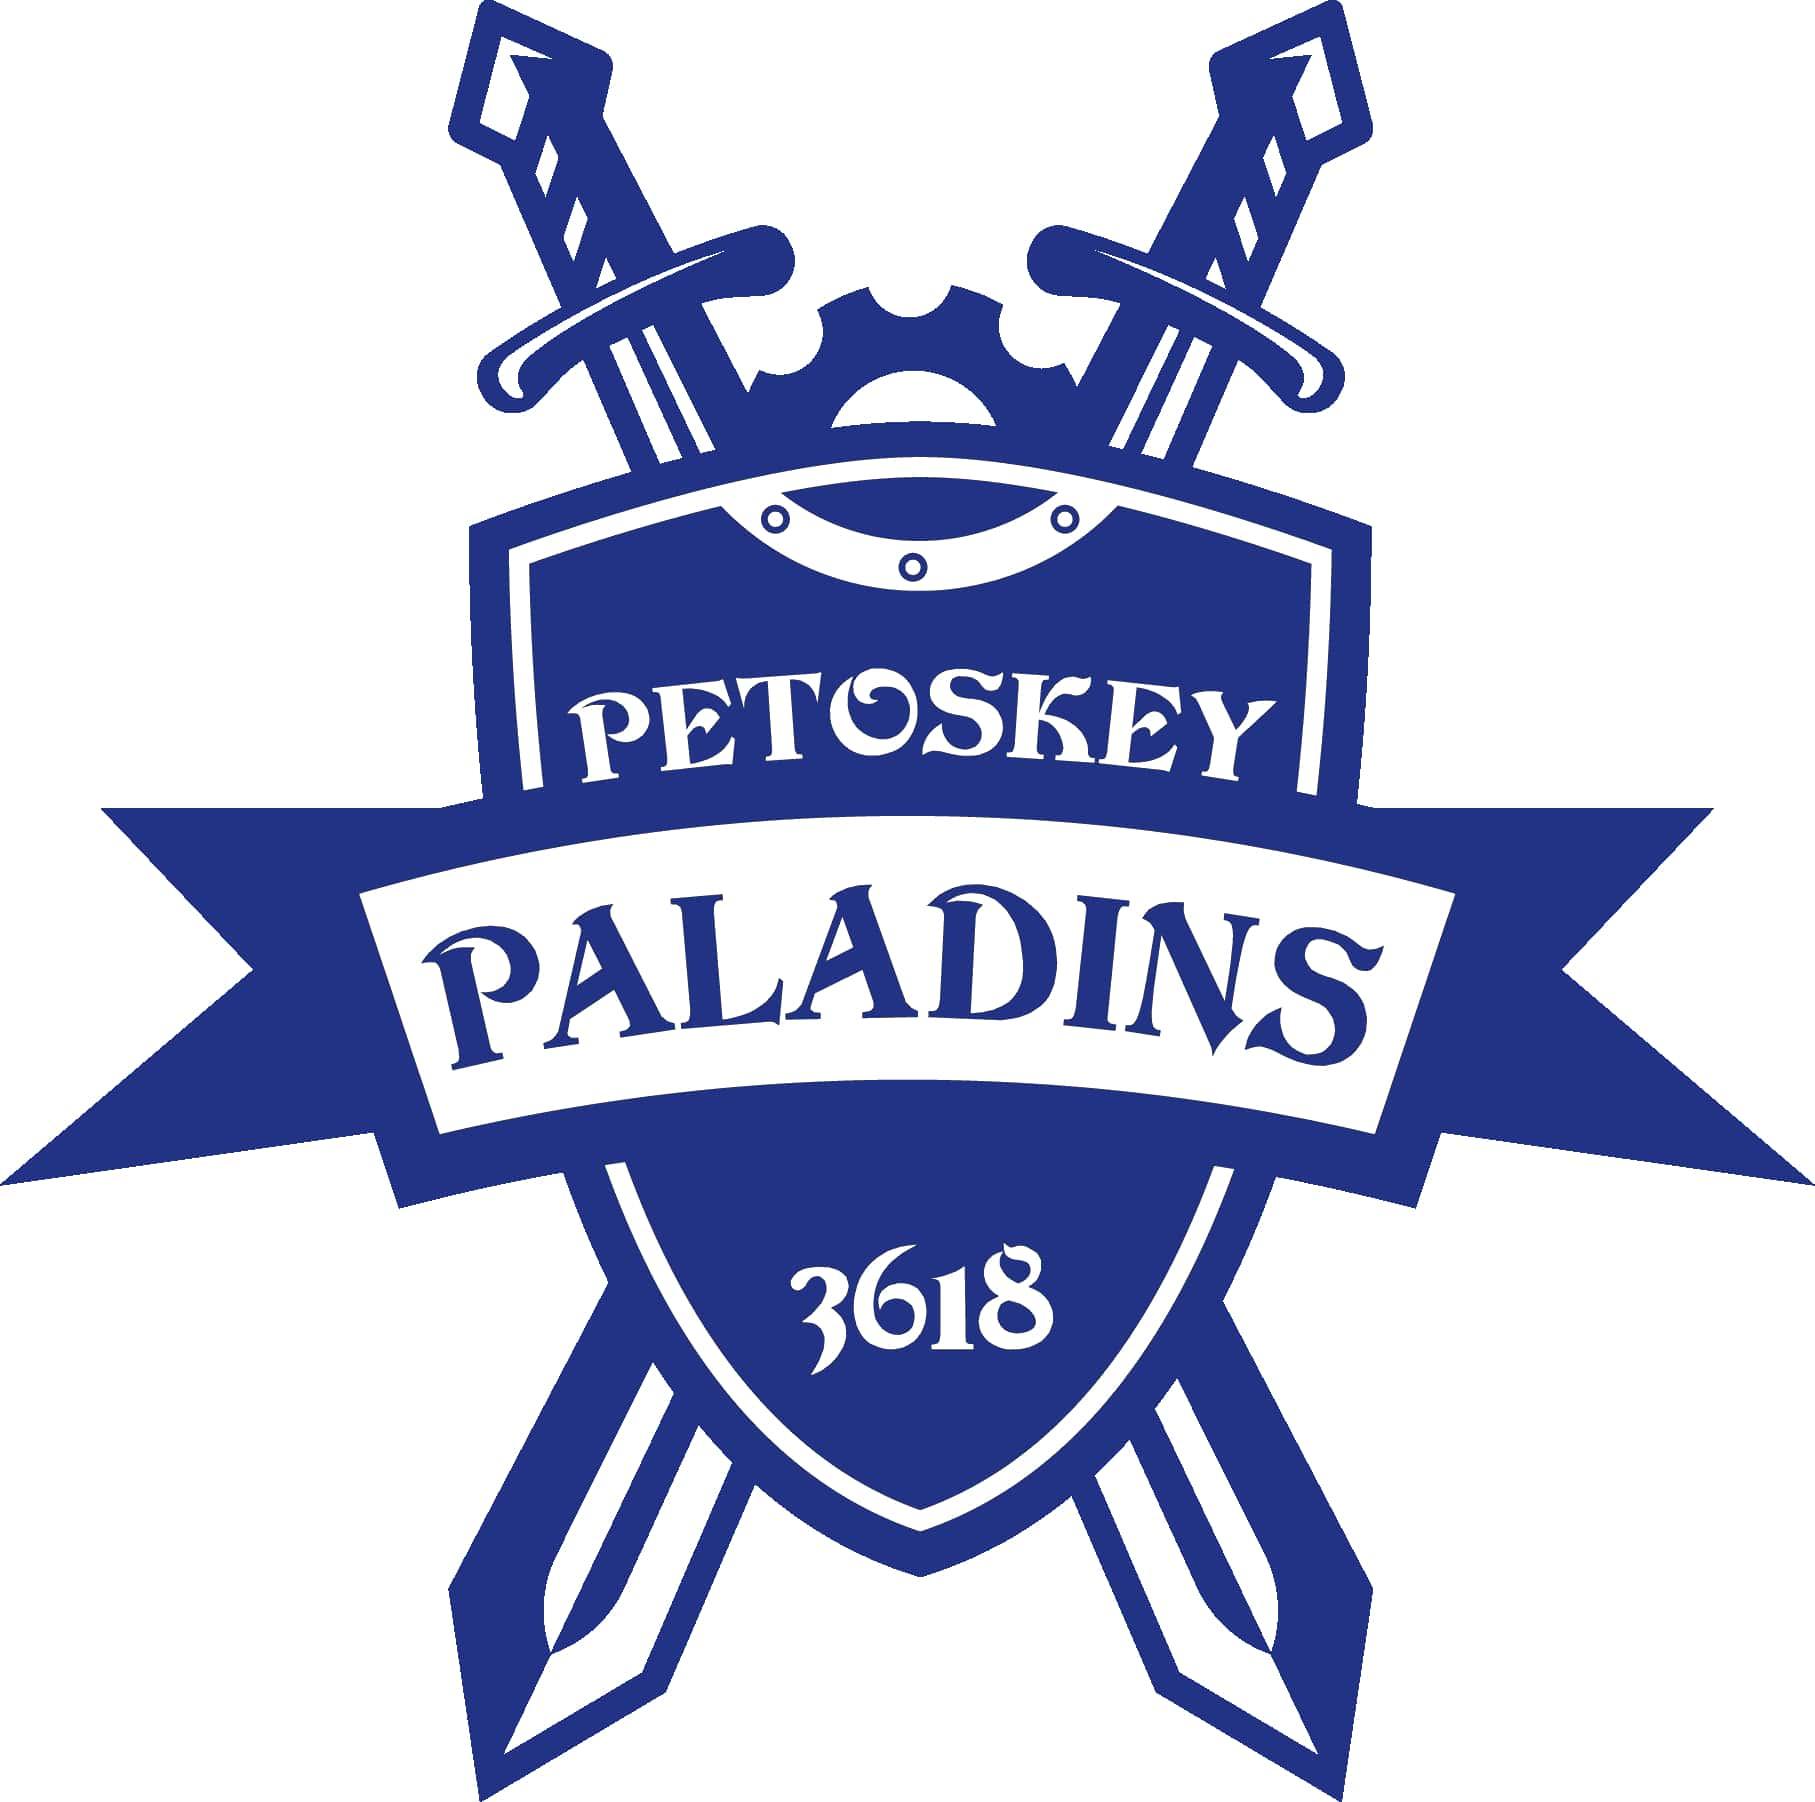 petoskey paladins blue.png